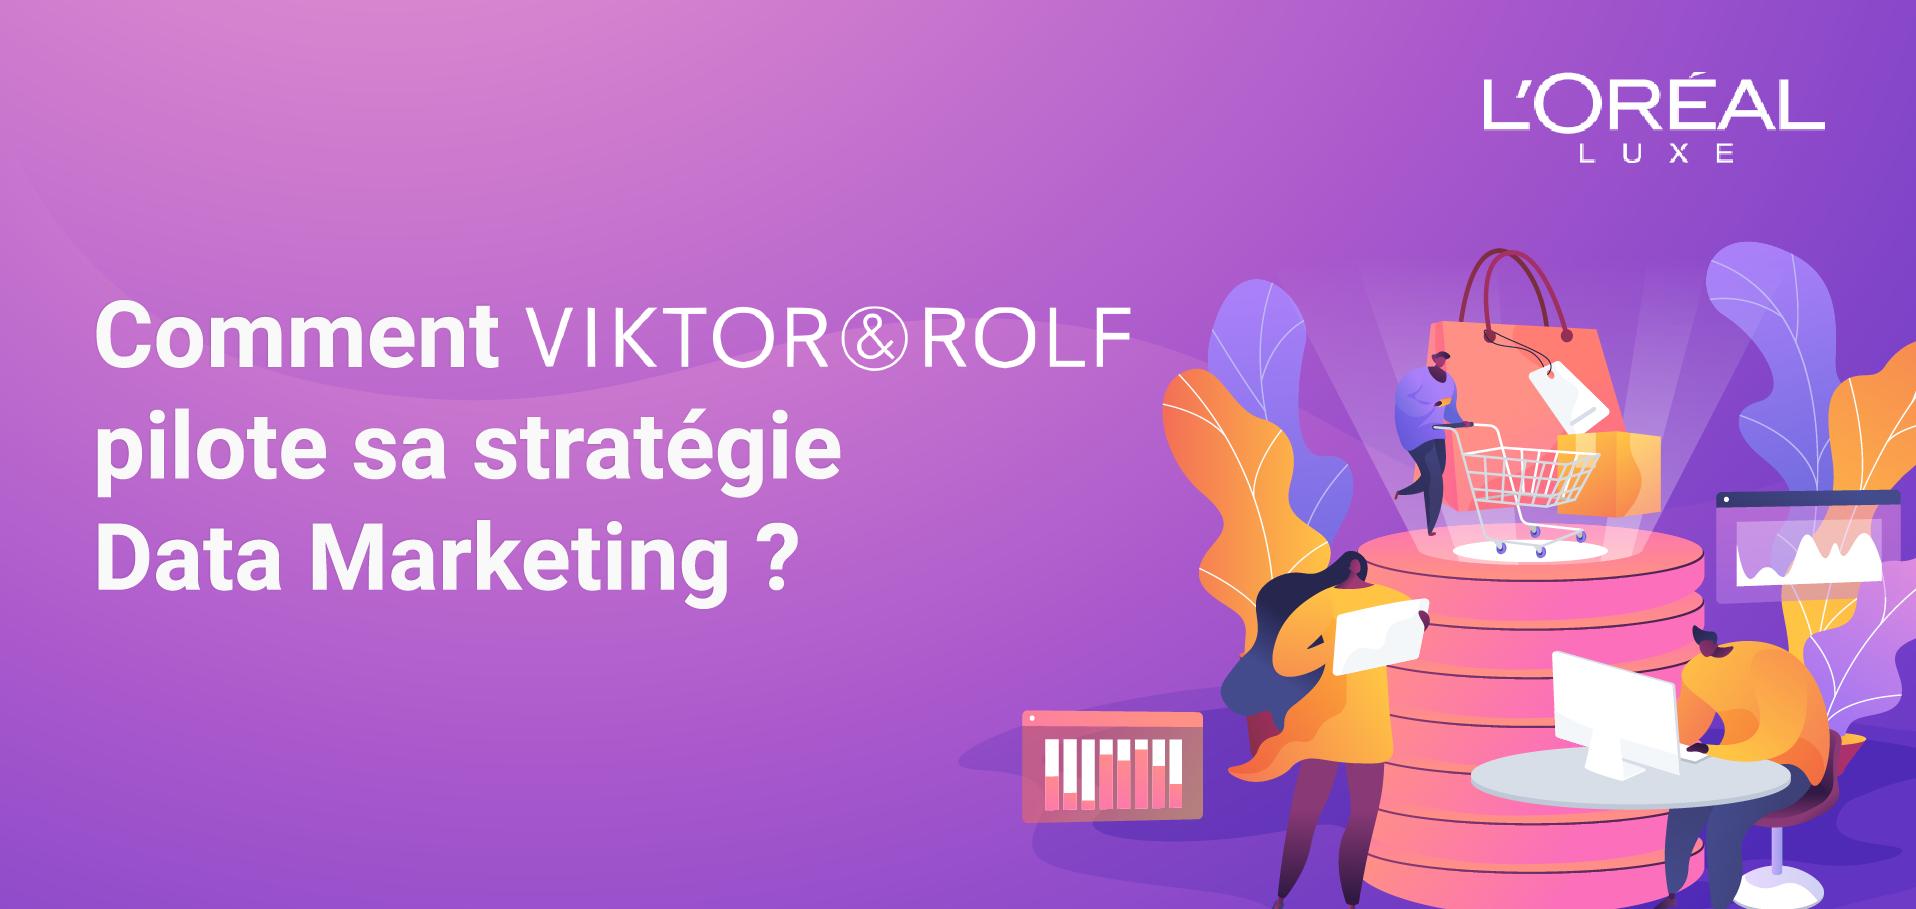 Webinar Comment Viktor & Rolf pilote sa stratégie Data Marketing